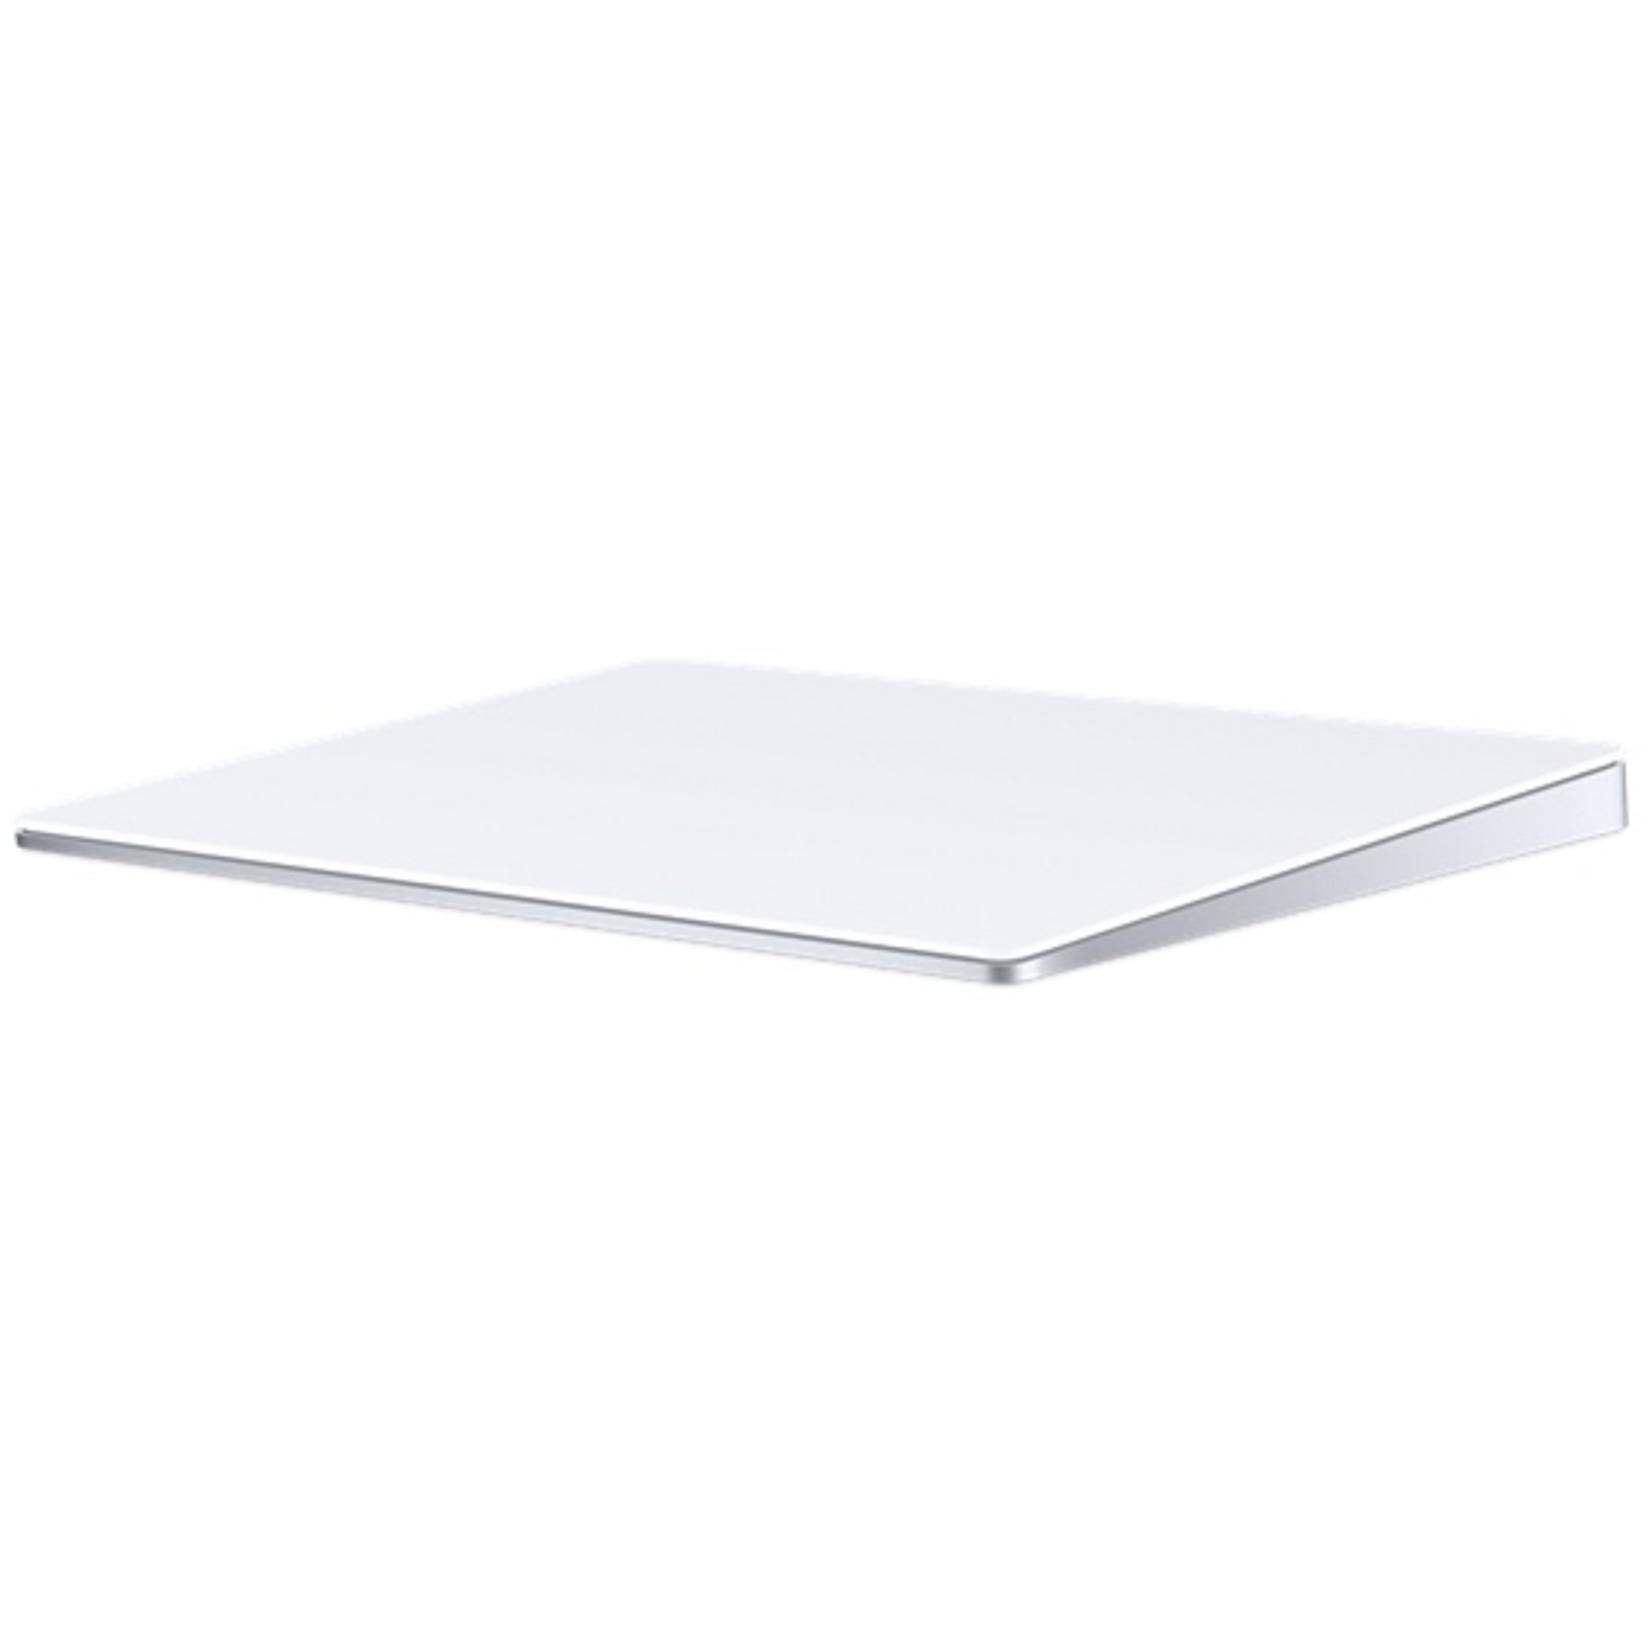 Apple Magic Trackpad - OLD